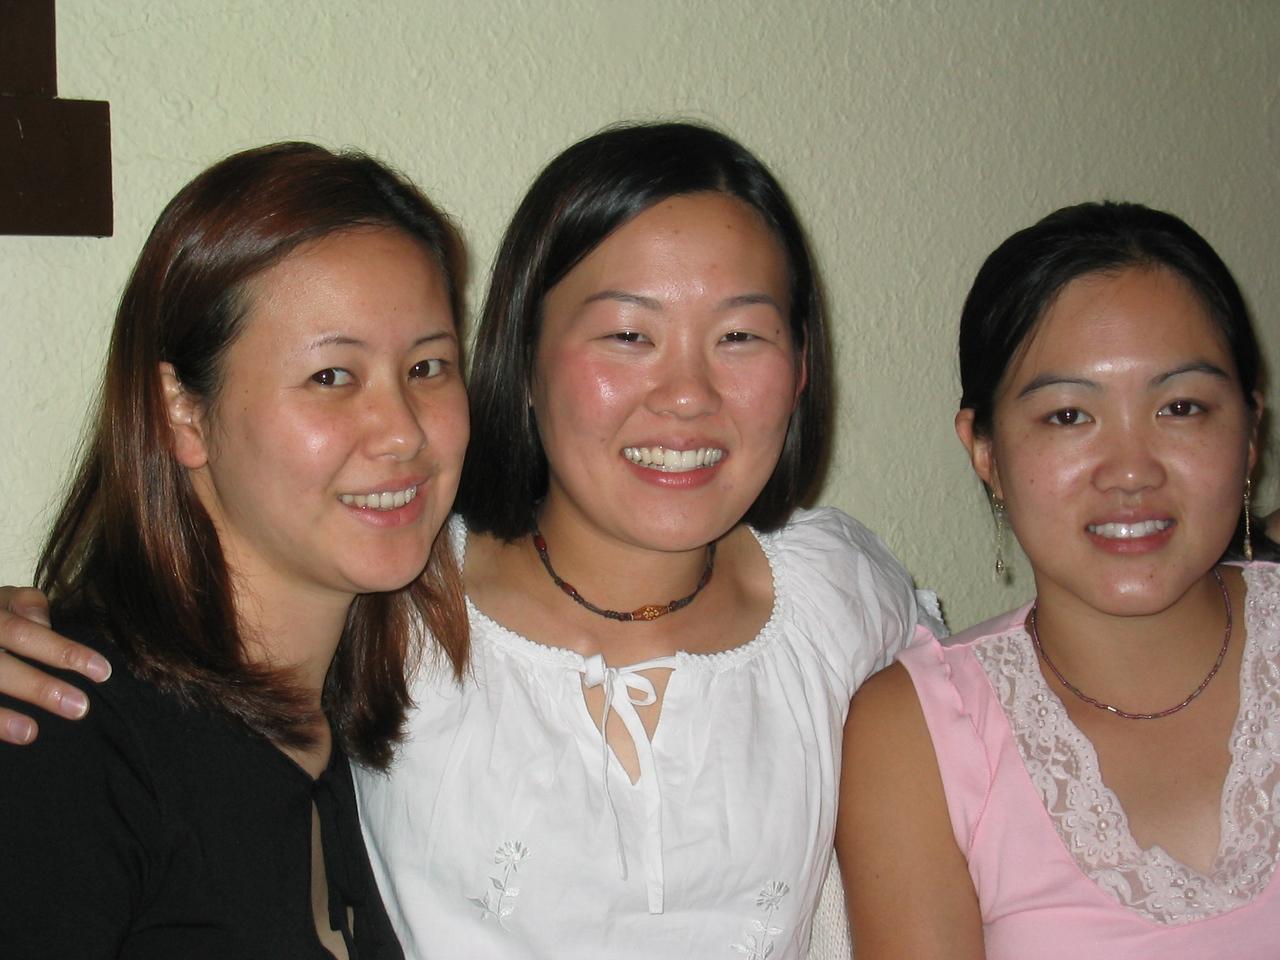 2003 09 05 Friday - Joanna Chi, Leslie Lin, Bernice Chen with flash